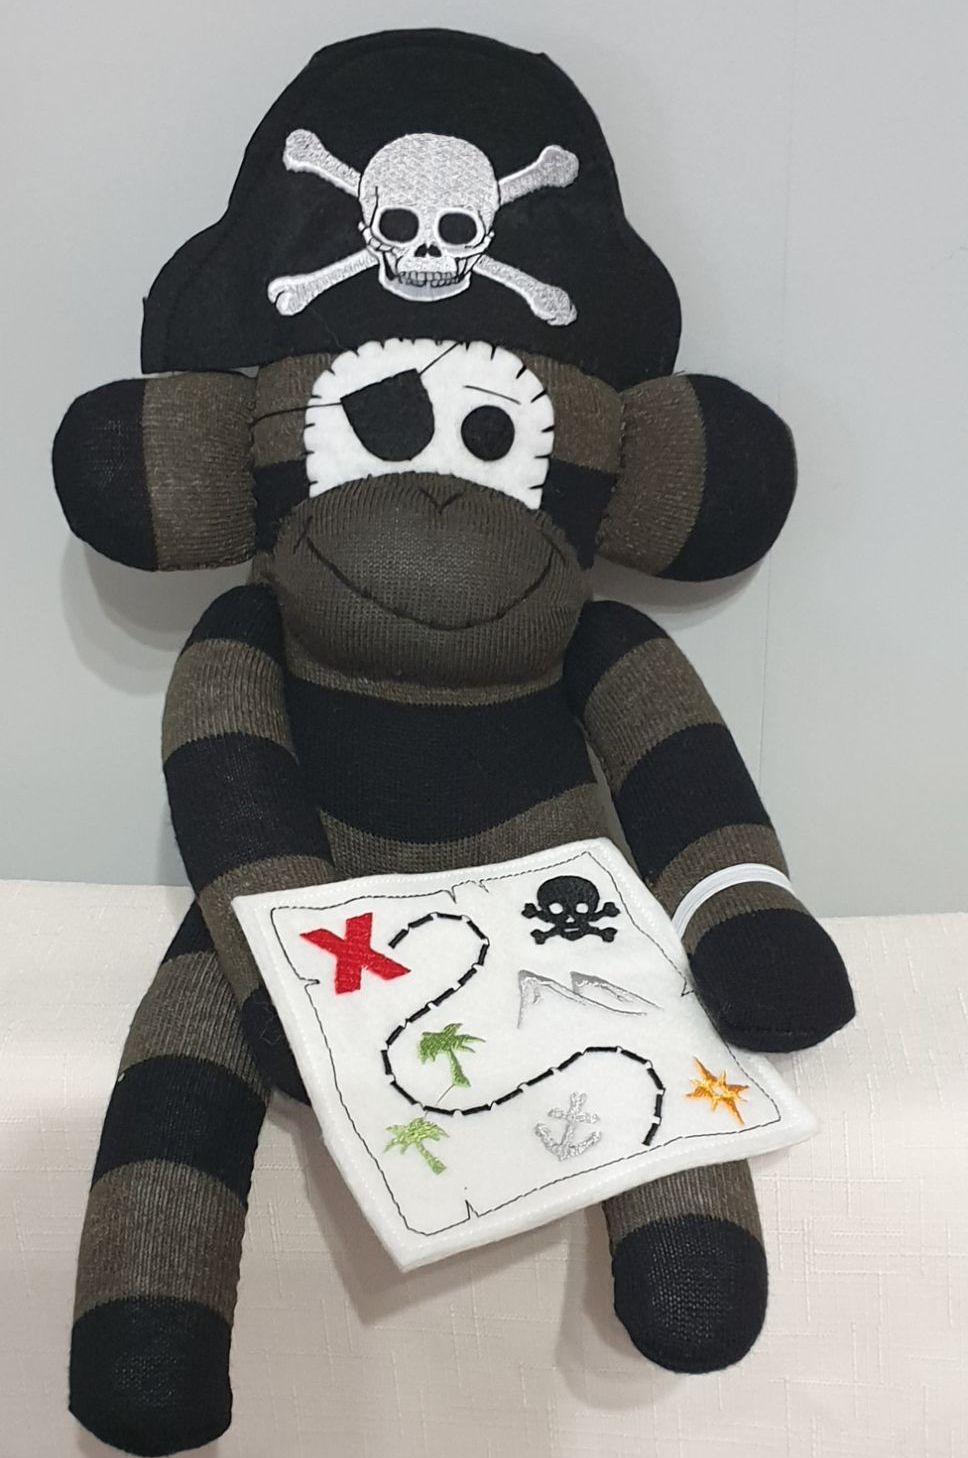 Khaki & Black Pirate Sock Monkey with Treasure Map. Handmade by Sockadoo